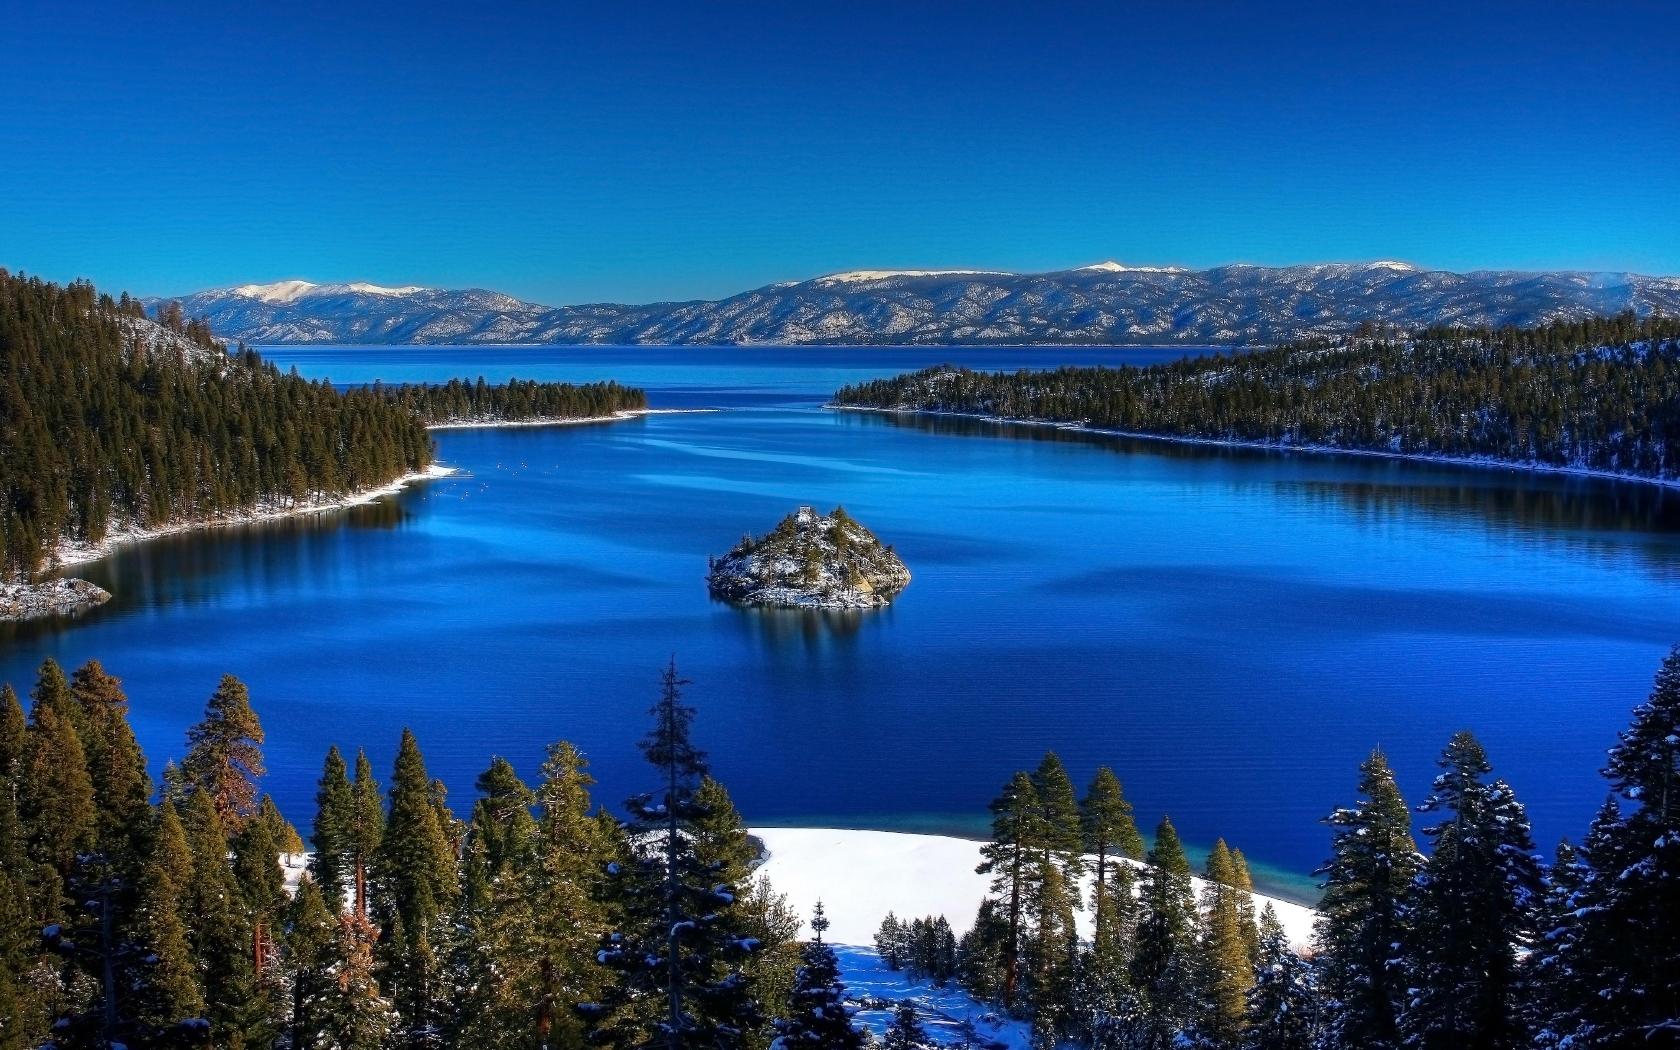 Free Lake Tahoe Wallpaper 37301 1920x1080 px